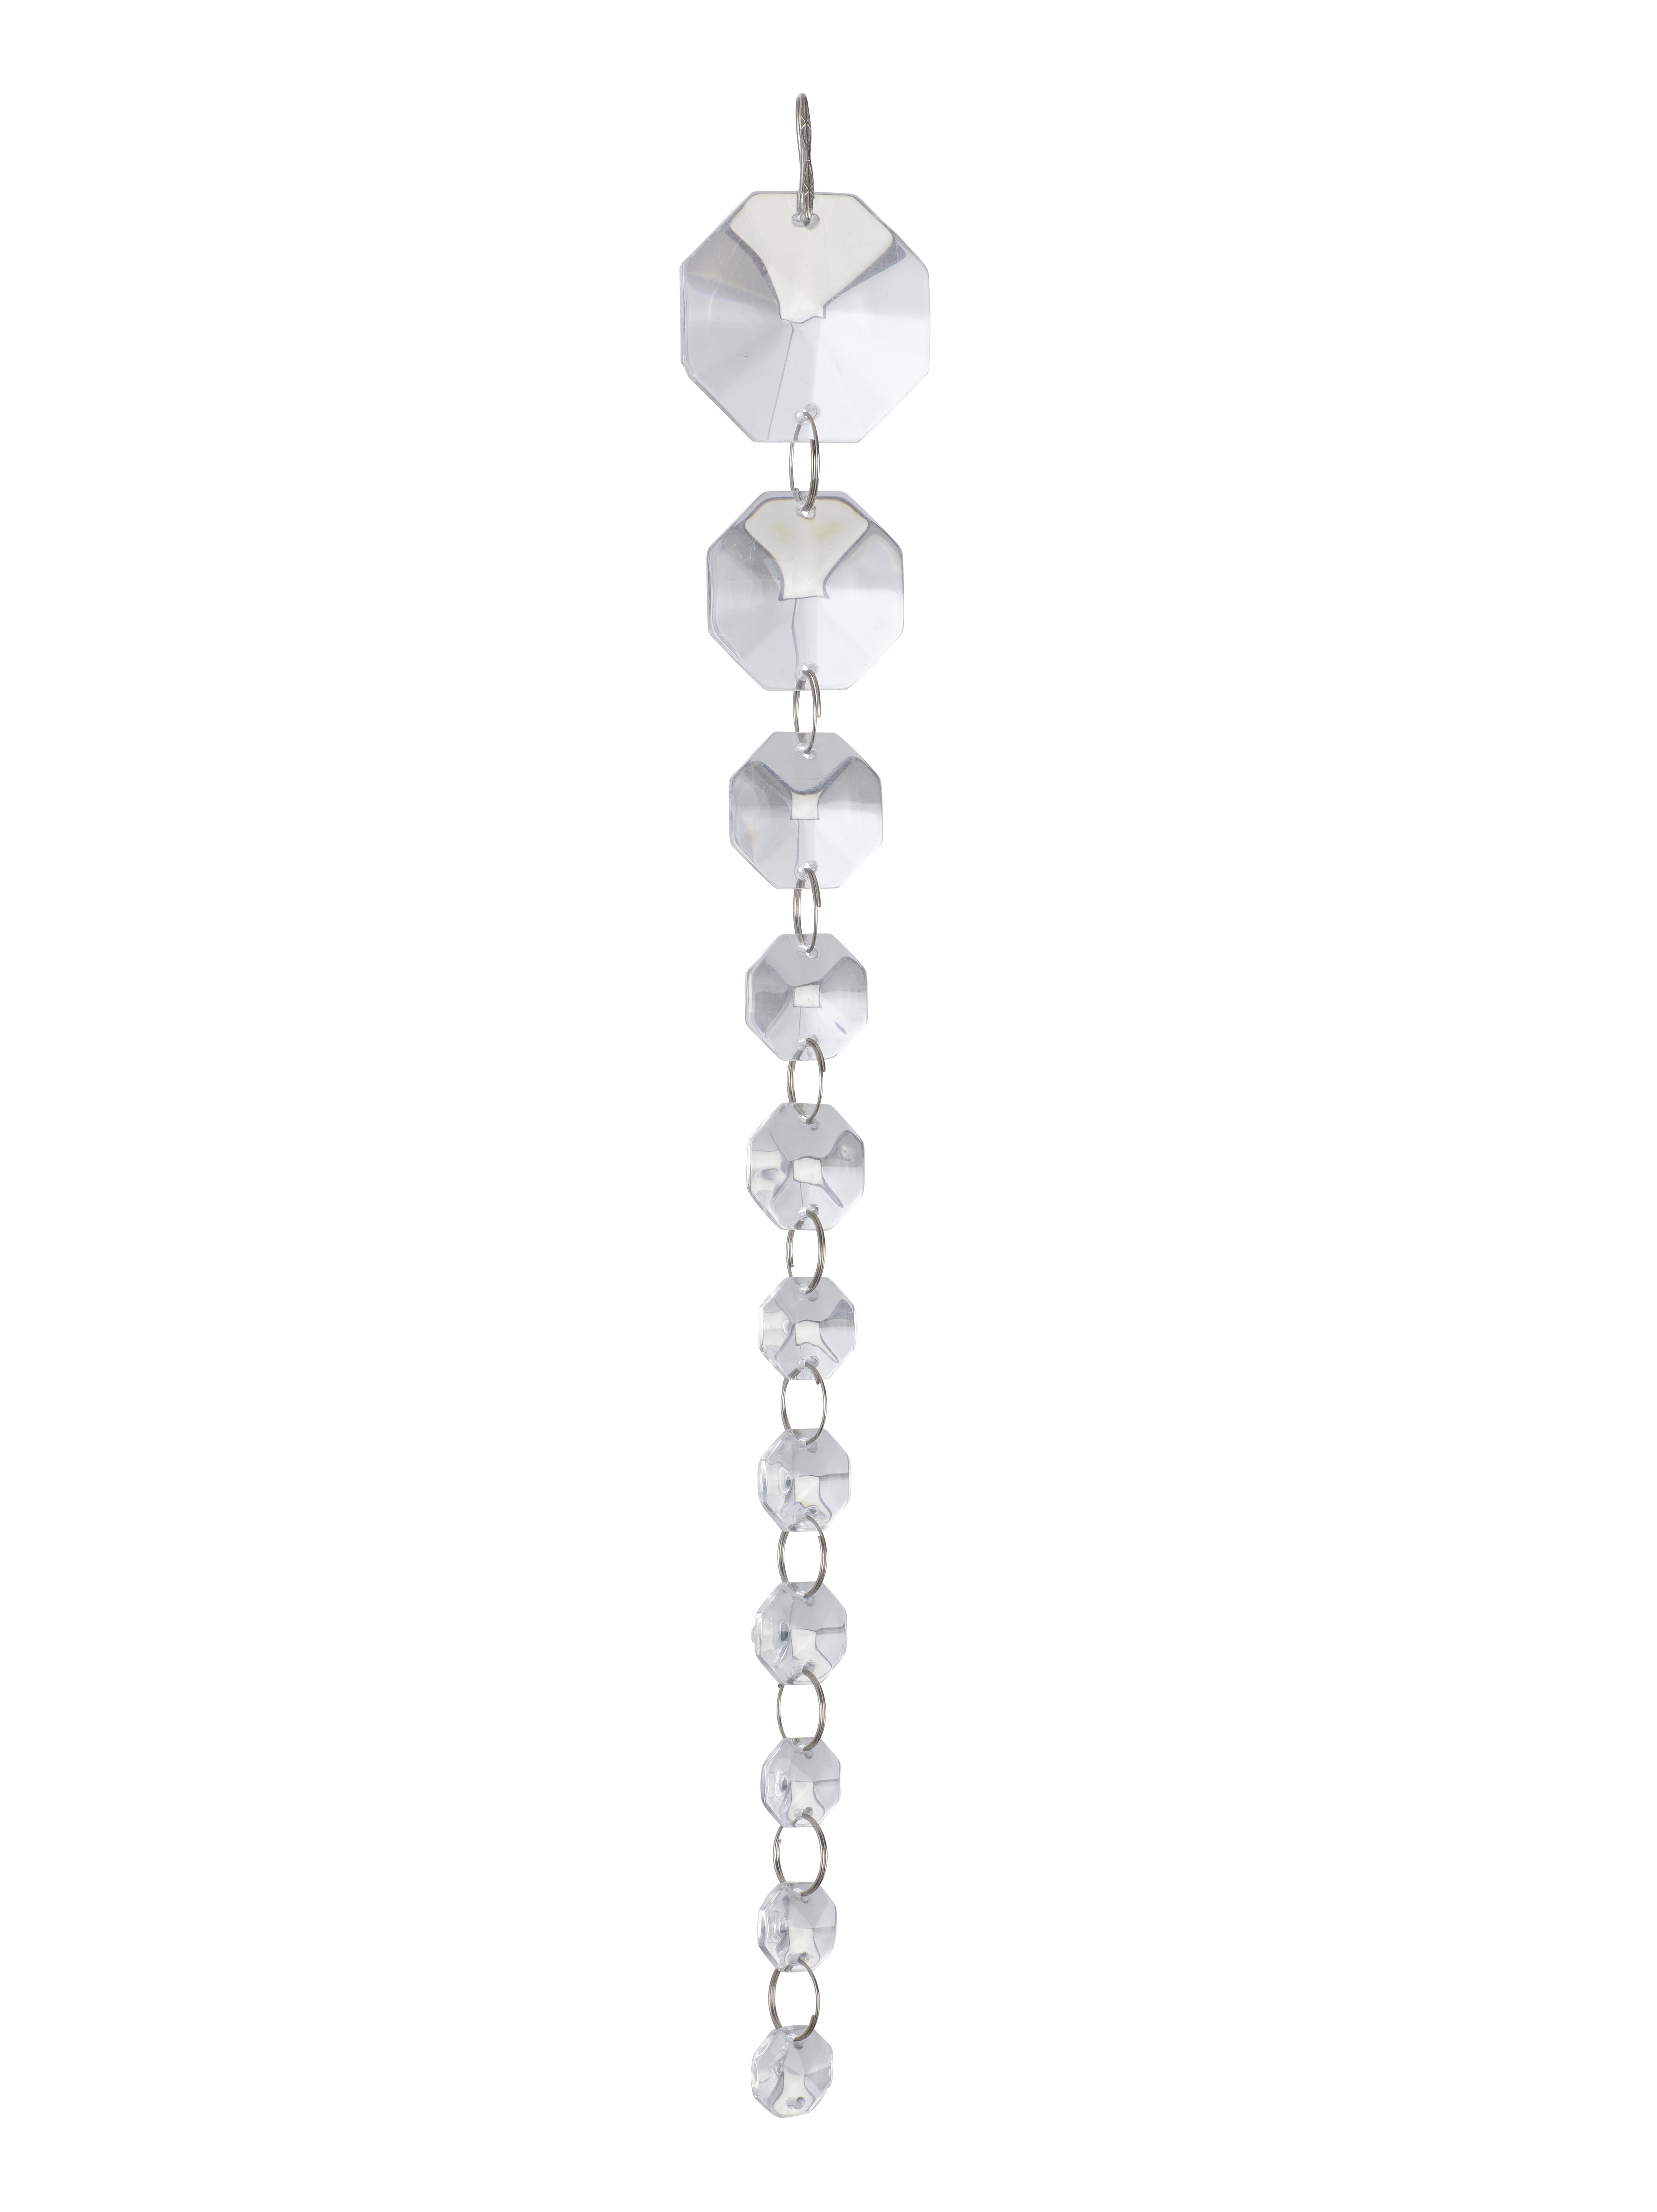 Prisms - Lower Lenght Gränsö 105317